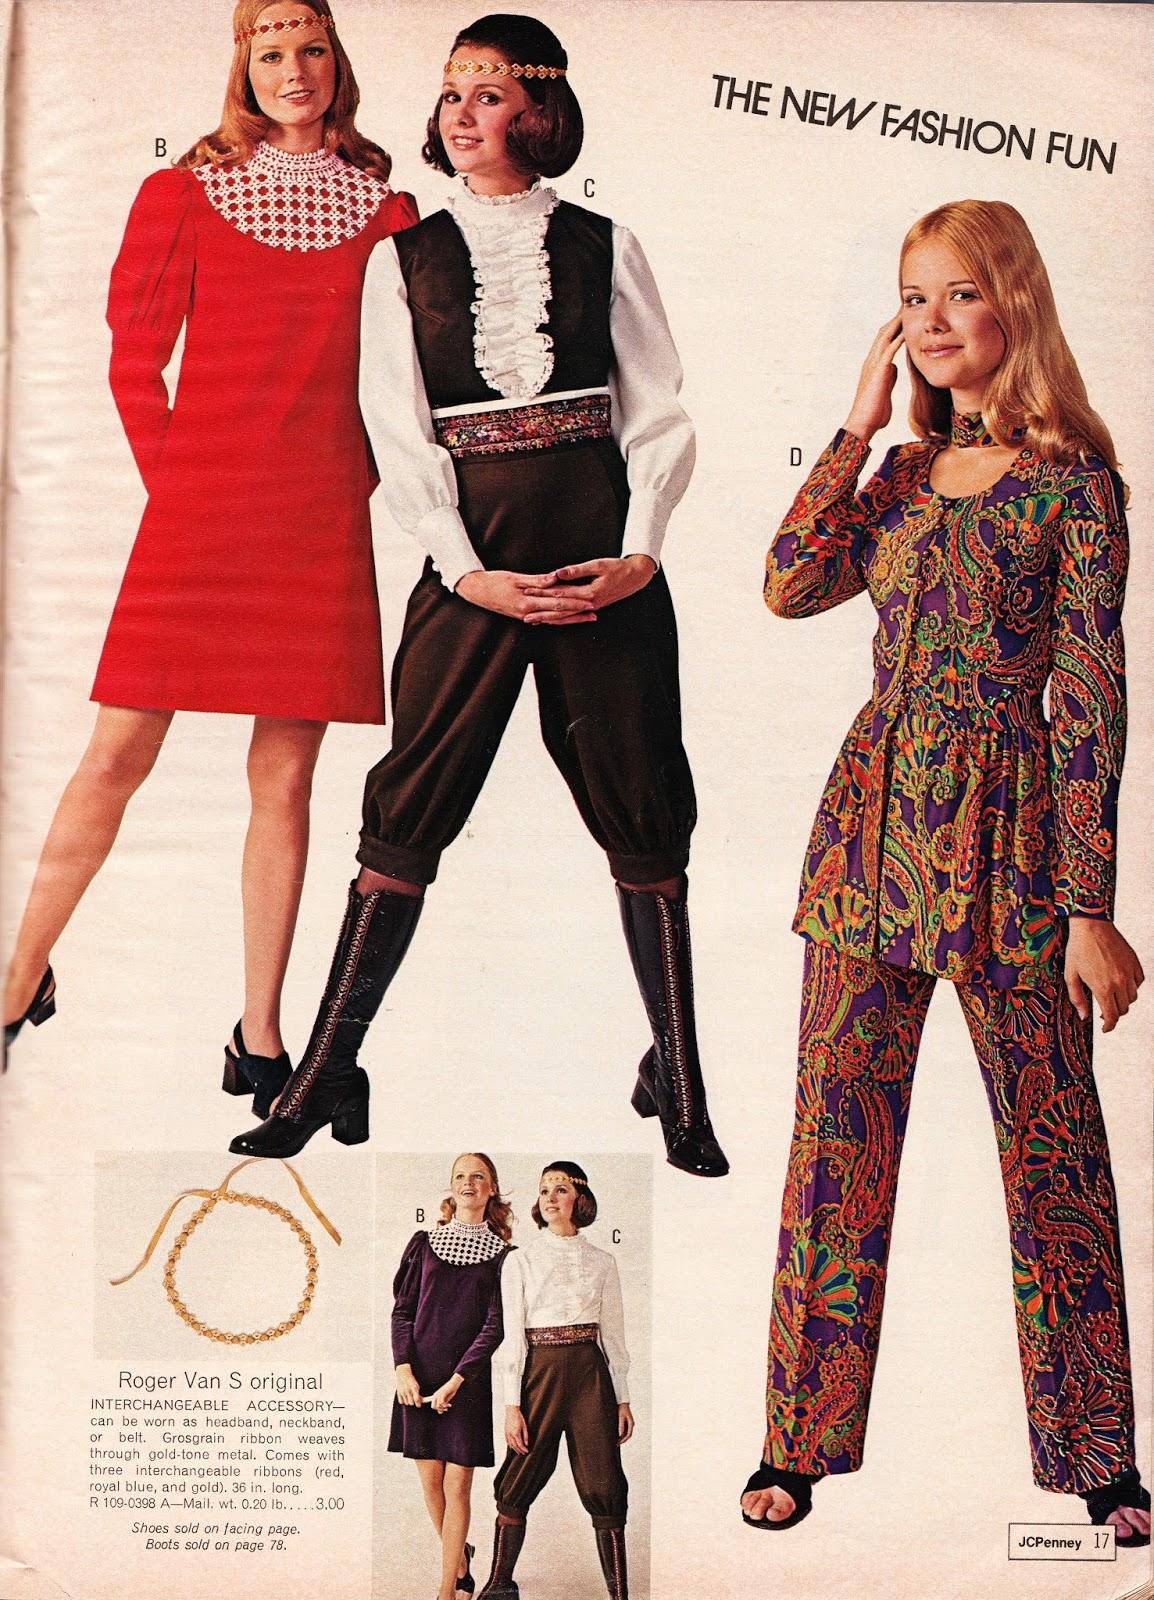 Kathy Loghry Blogspot: Random Goodness: Fall Fashion Fun